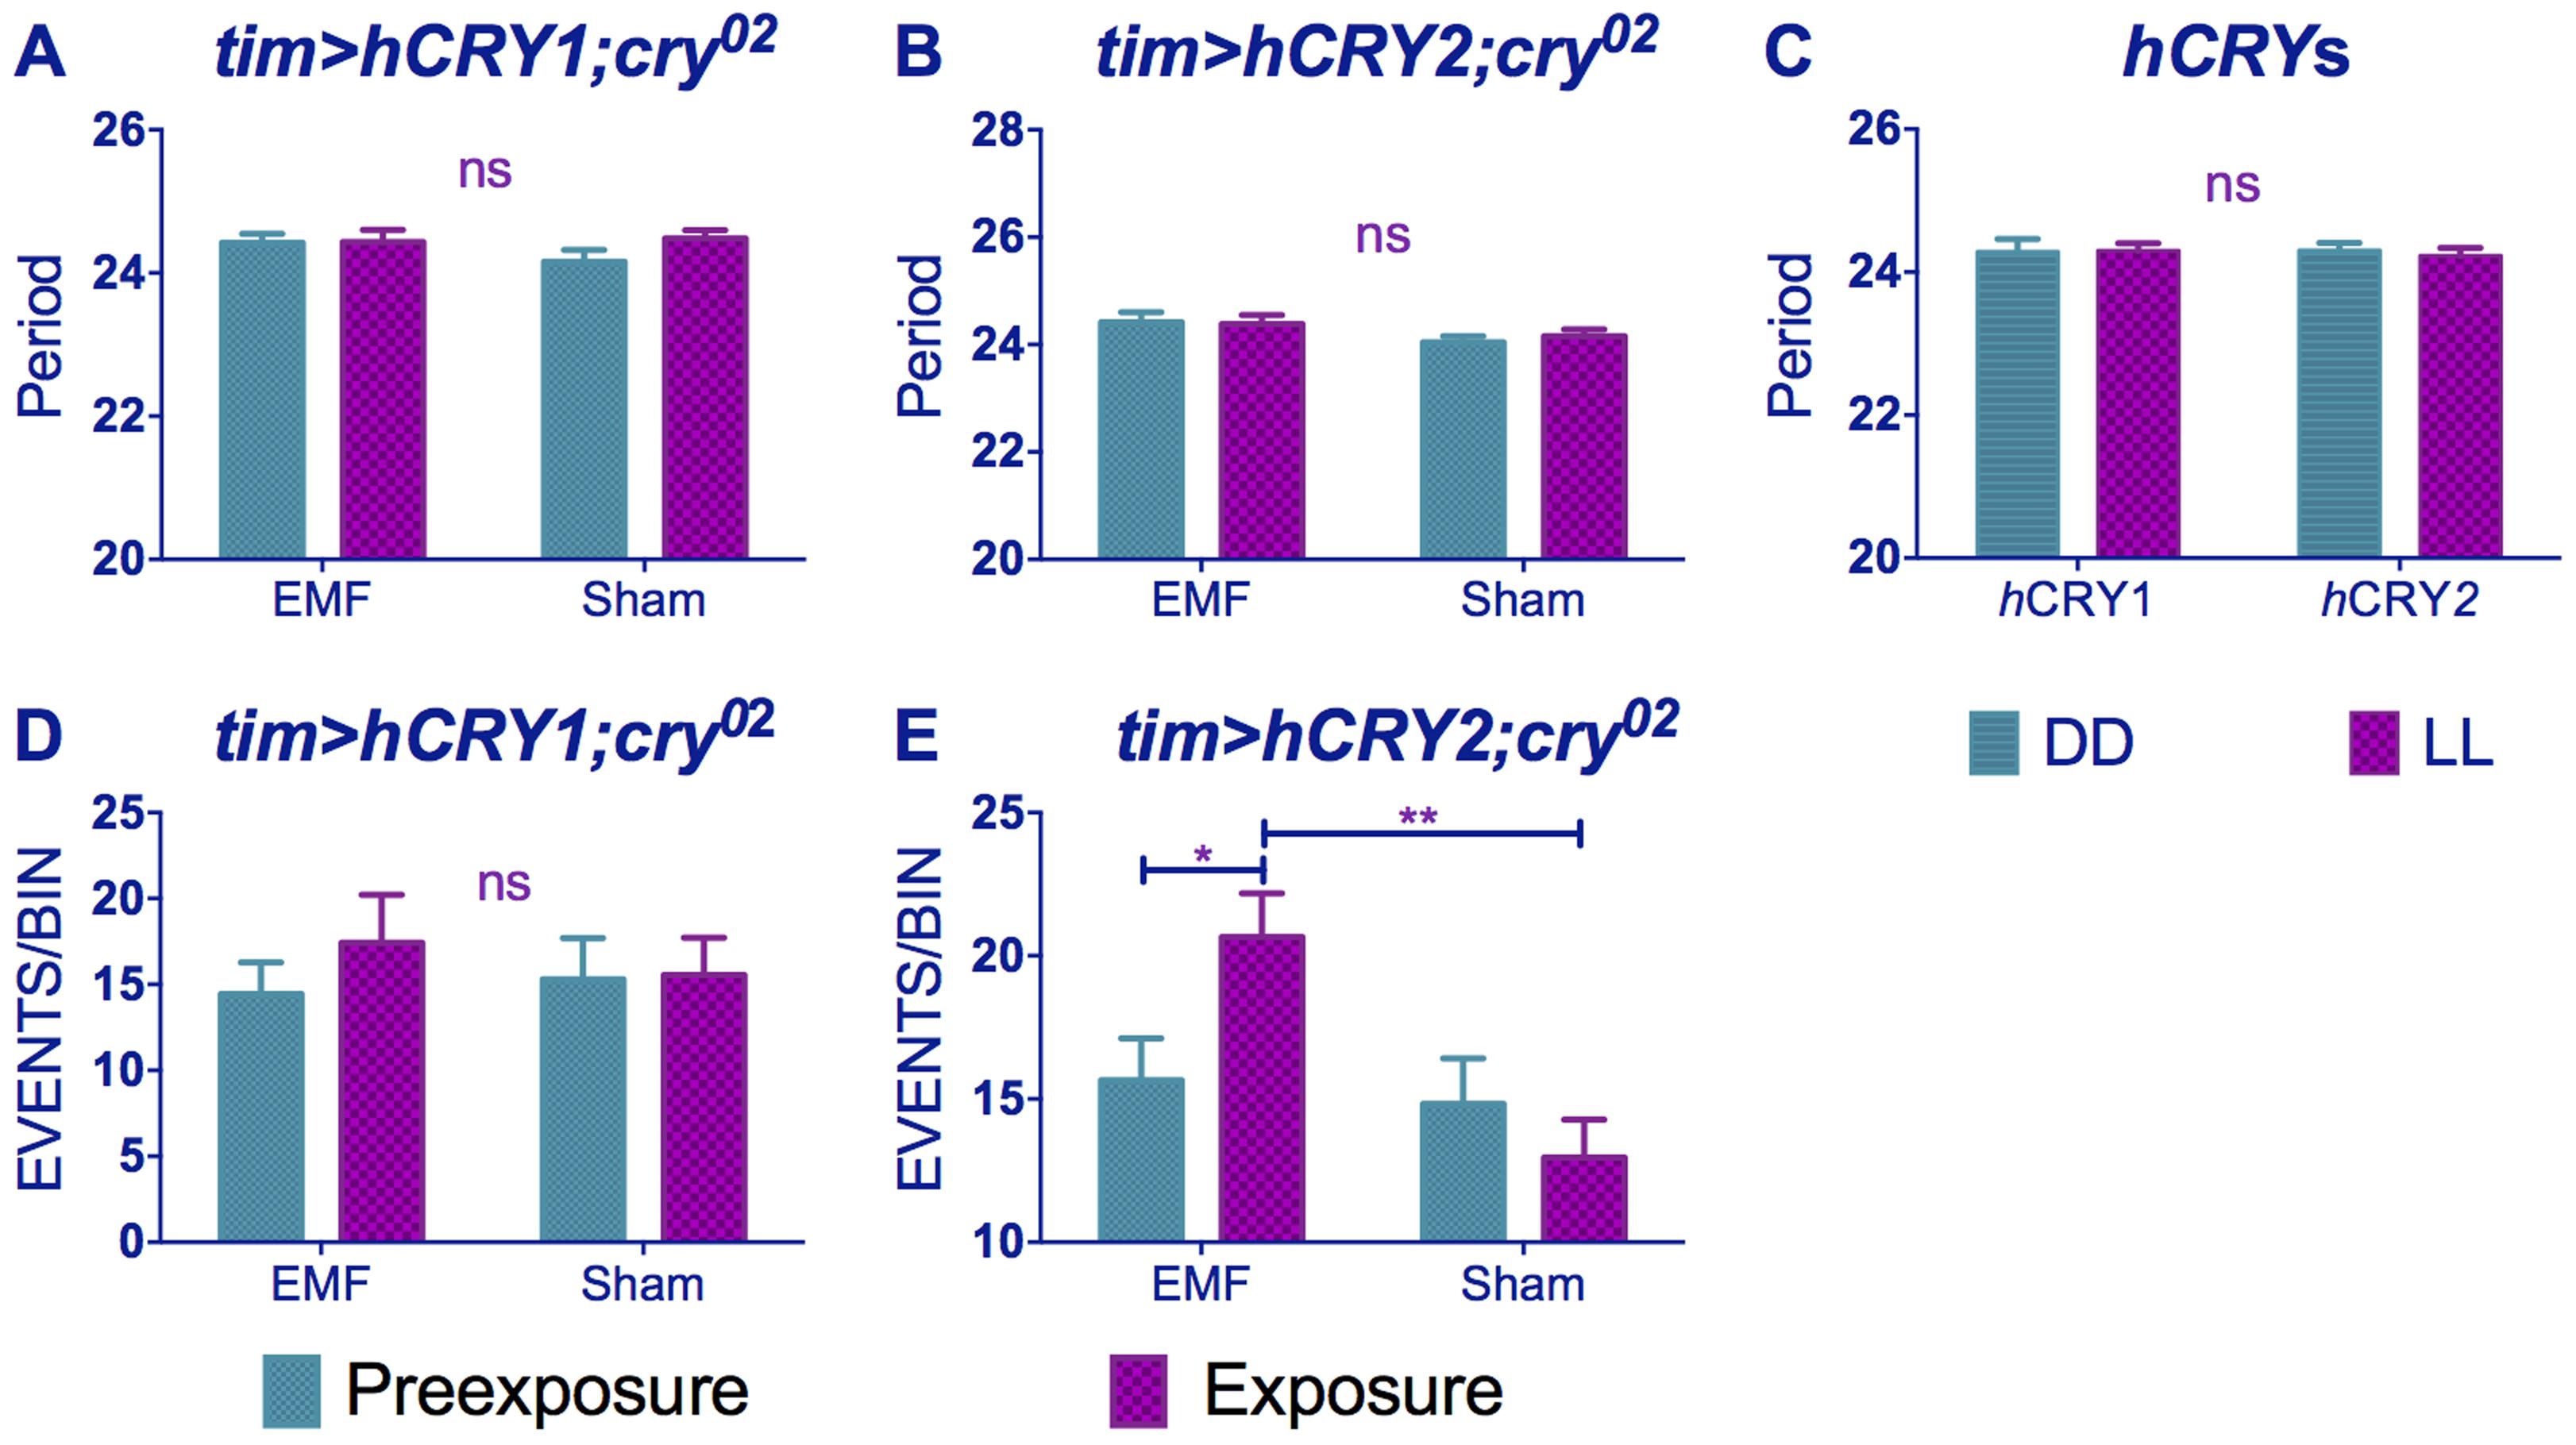 <i>hCRY2</i> but not <i>hCRY1</i> reveals a sensitivity to EMFs.